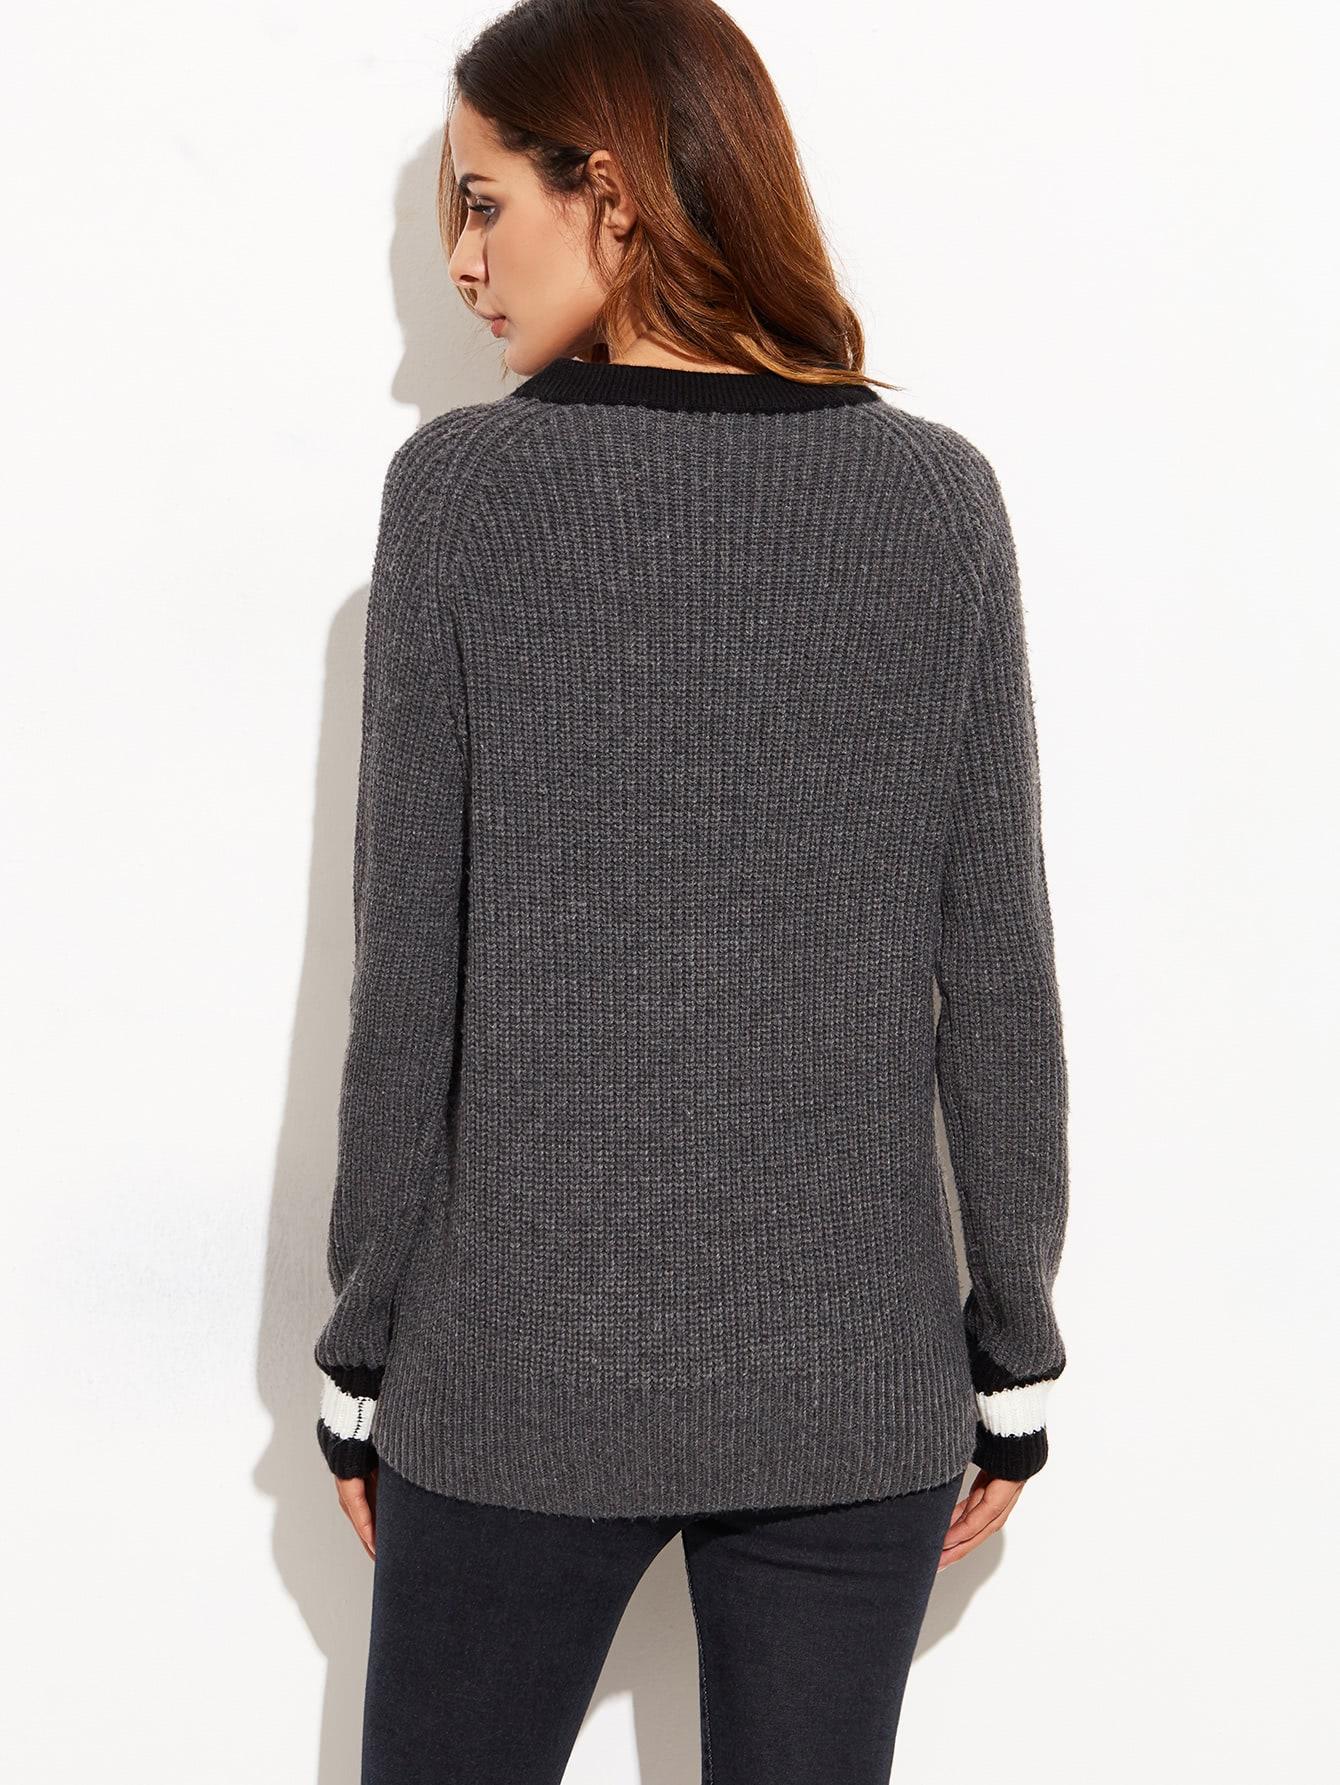 sweater160901452_2